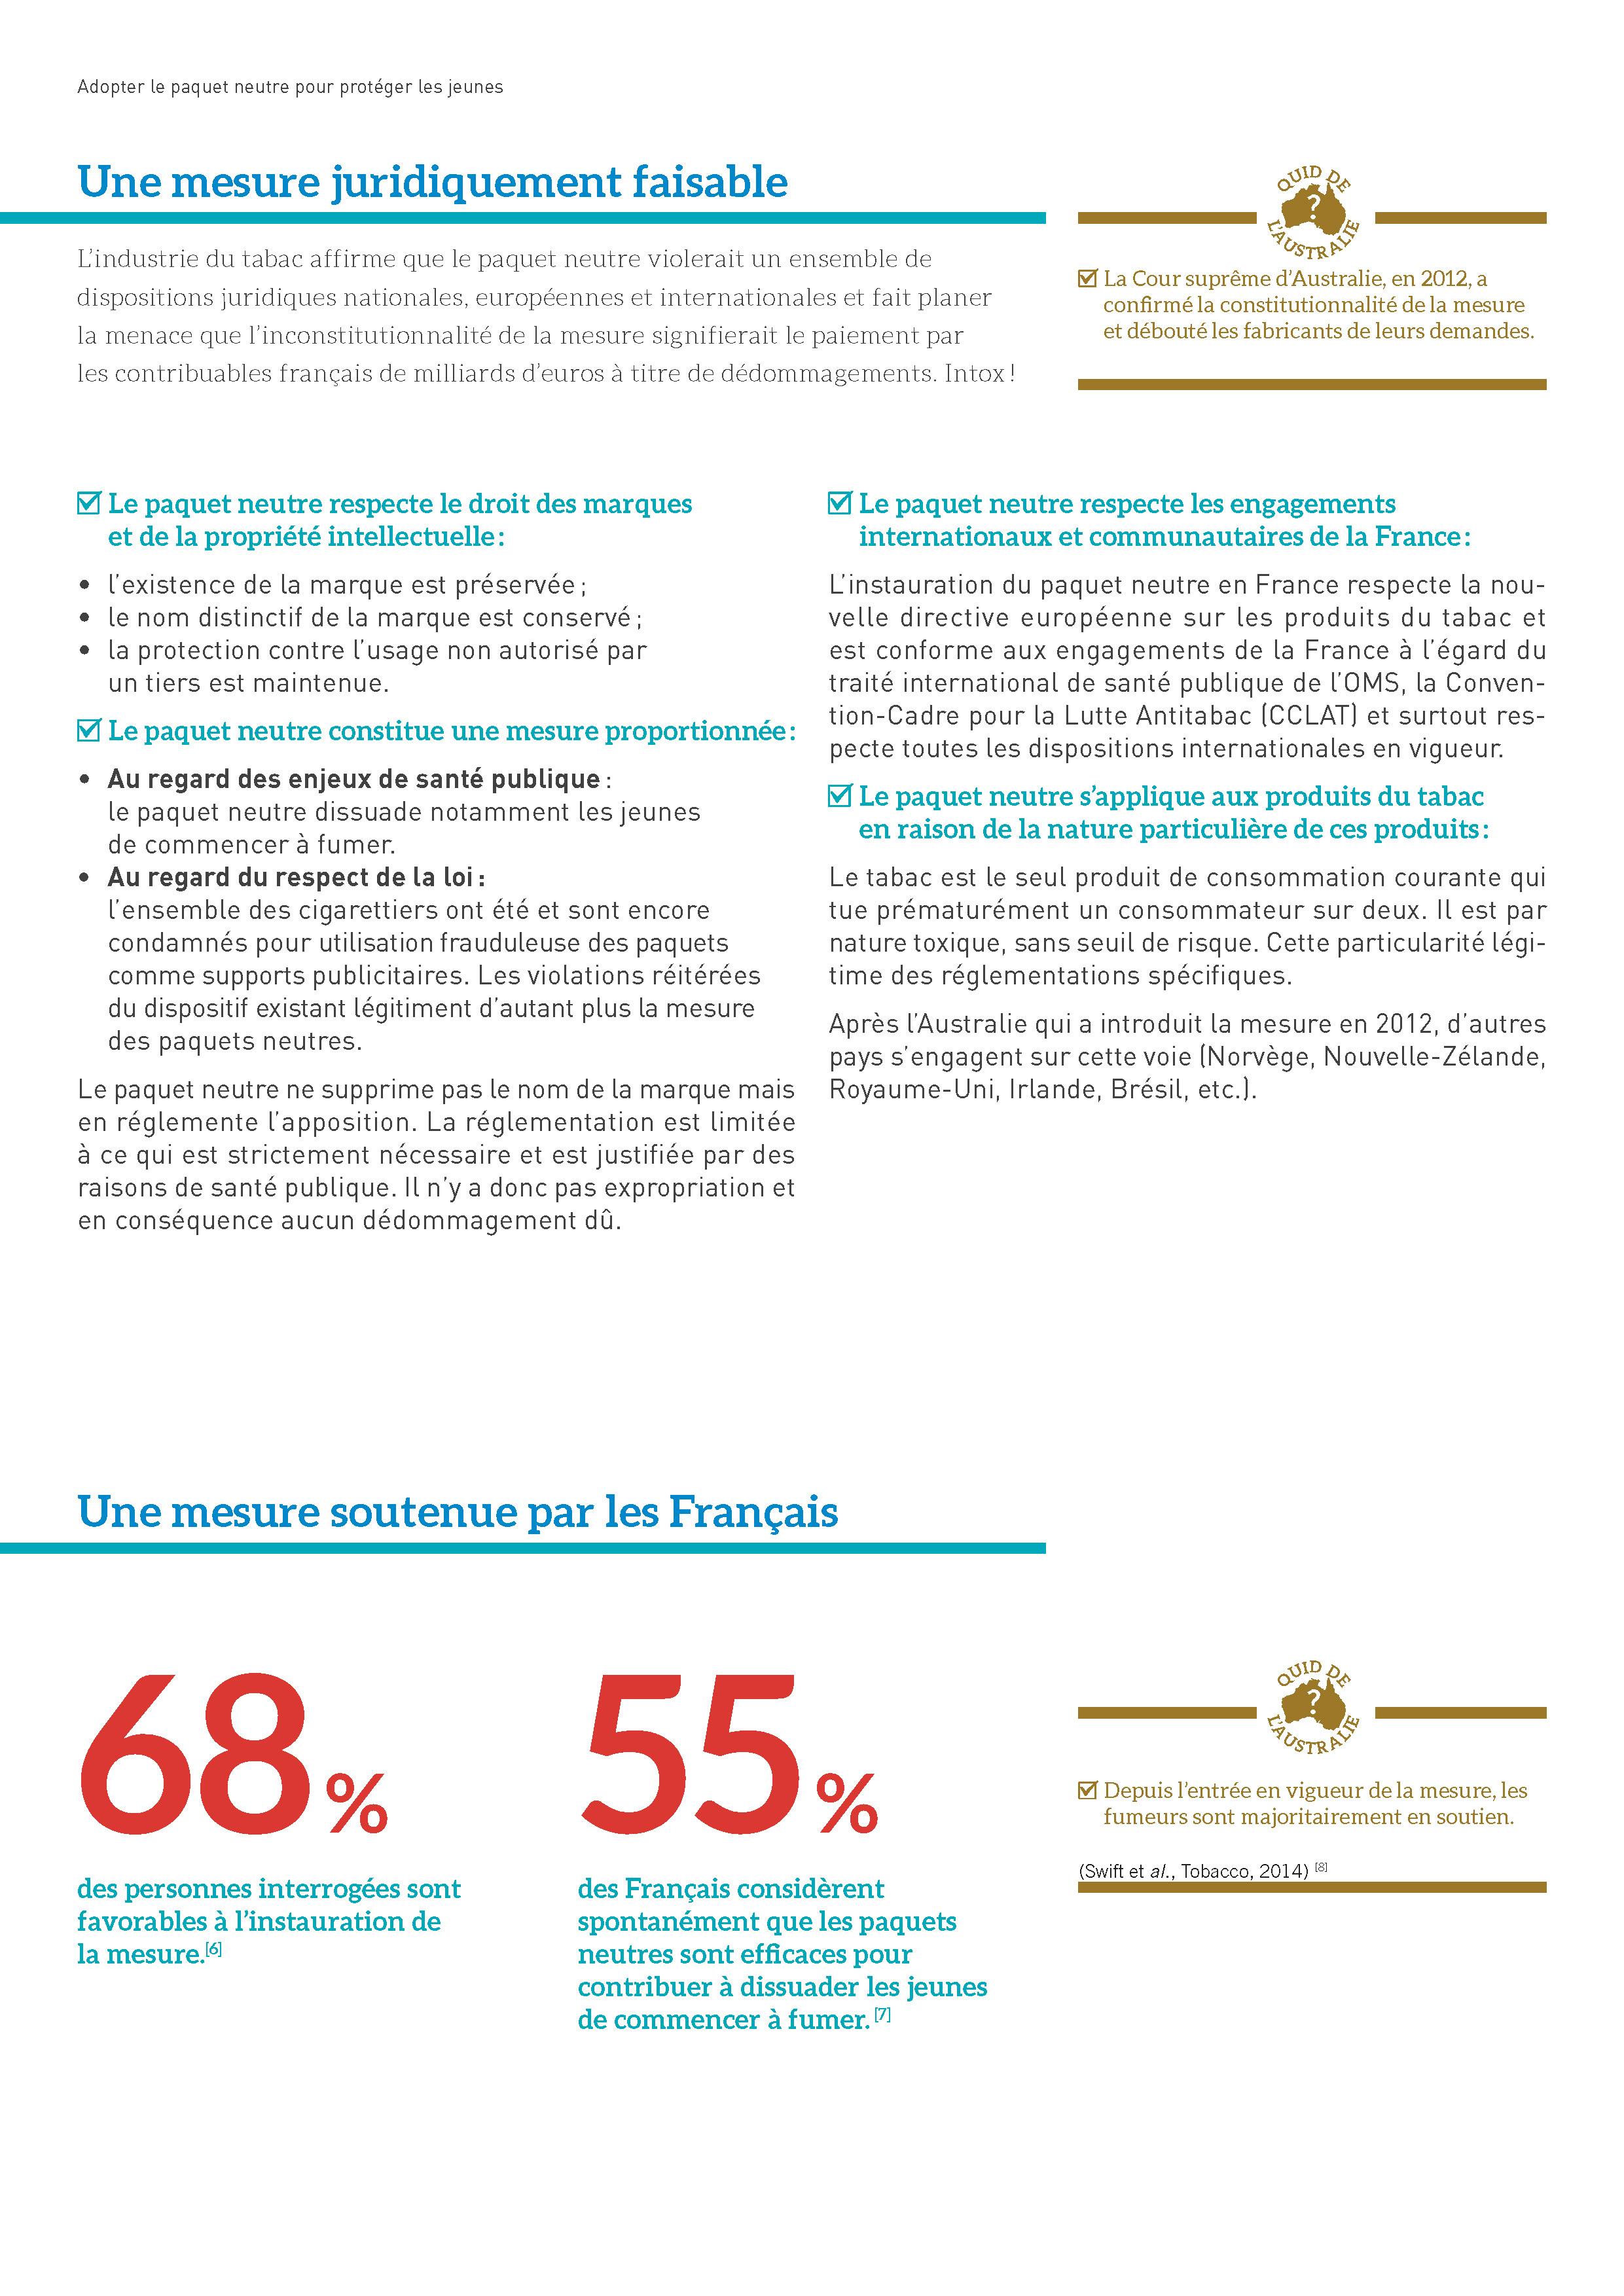 Alliance-DP_journee-mondiale-sans-tabac-avec-annexes-vf-30mai2016_Page_11.jpg